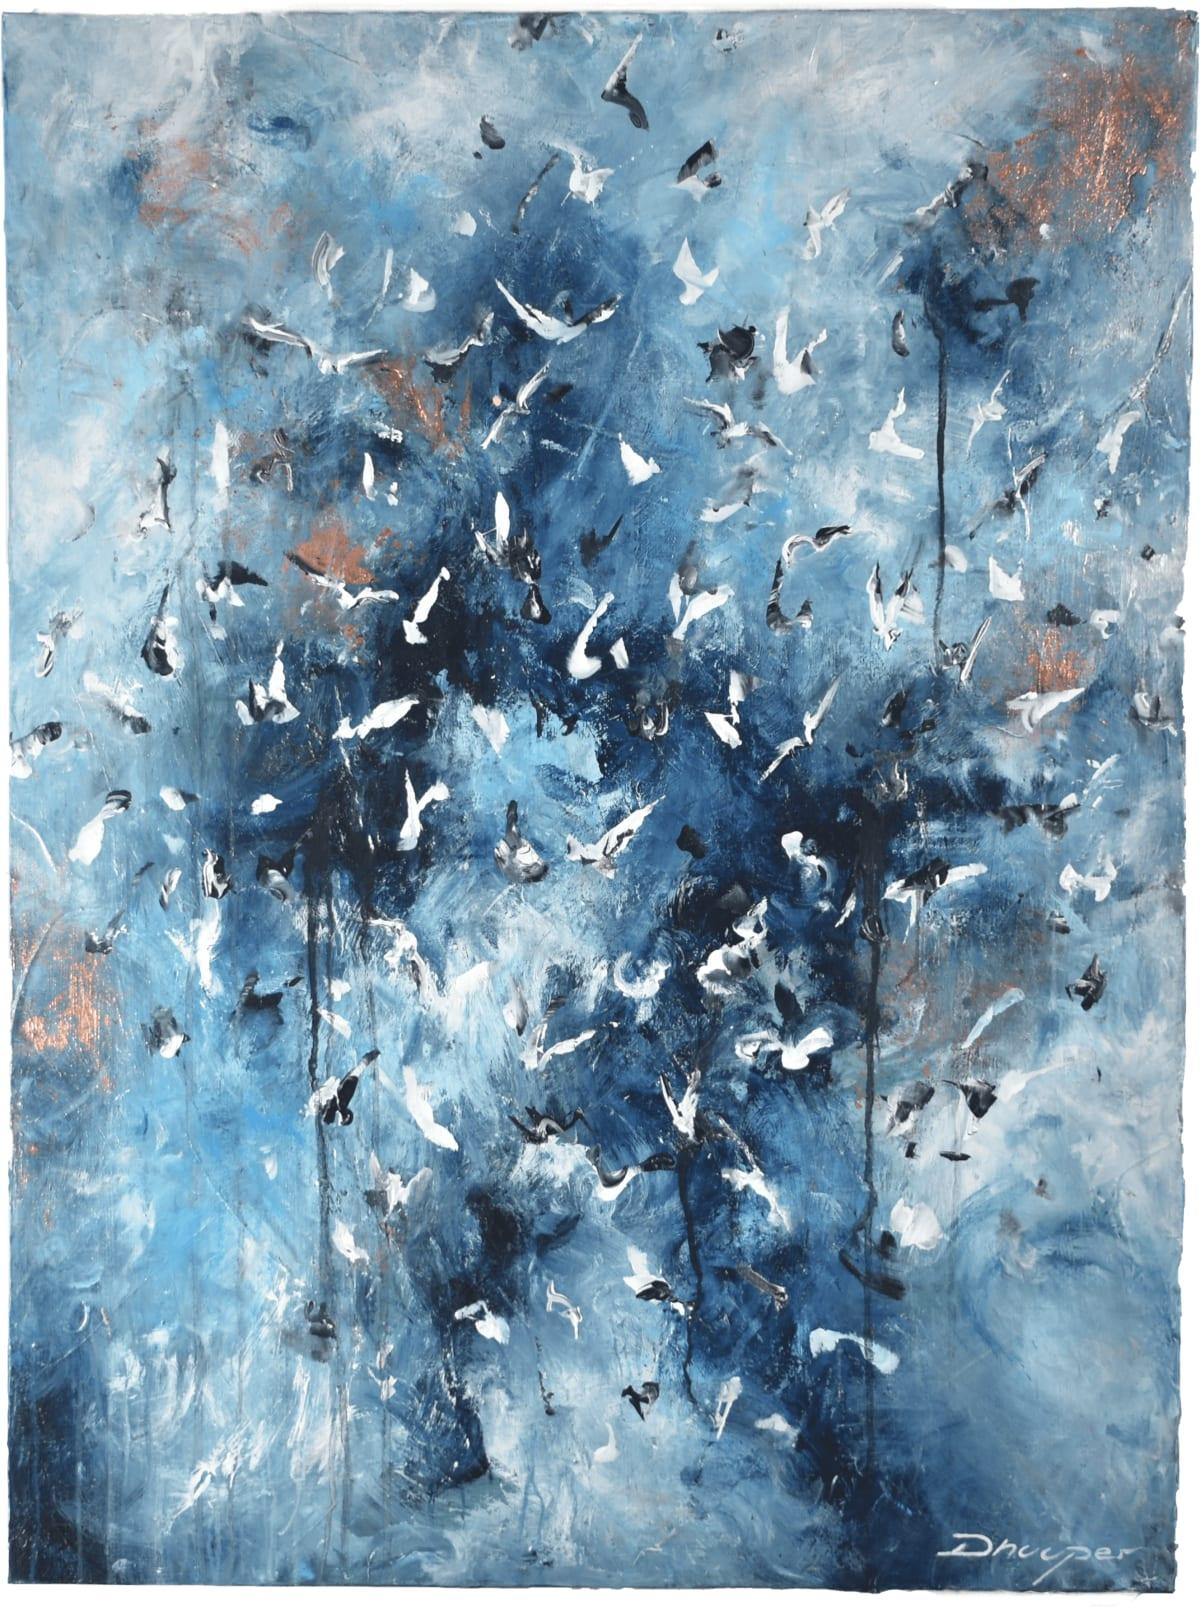 Daniel Hooper, Sea Angels